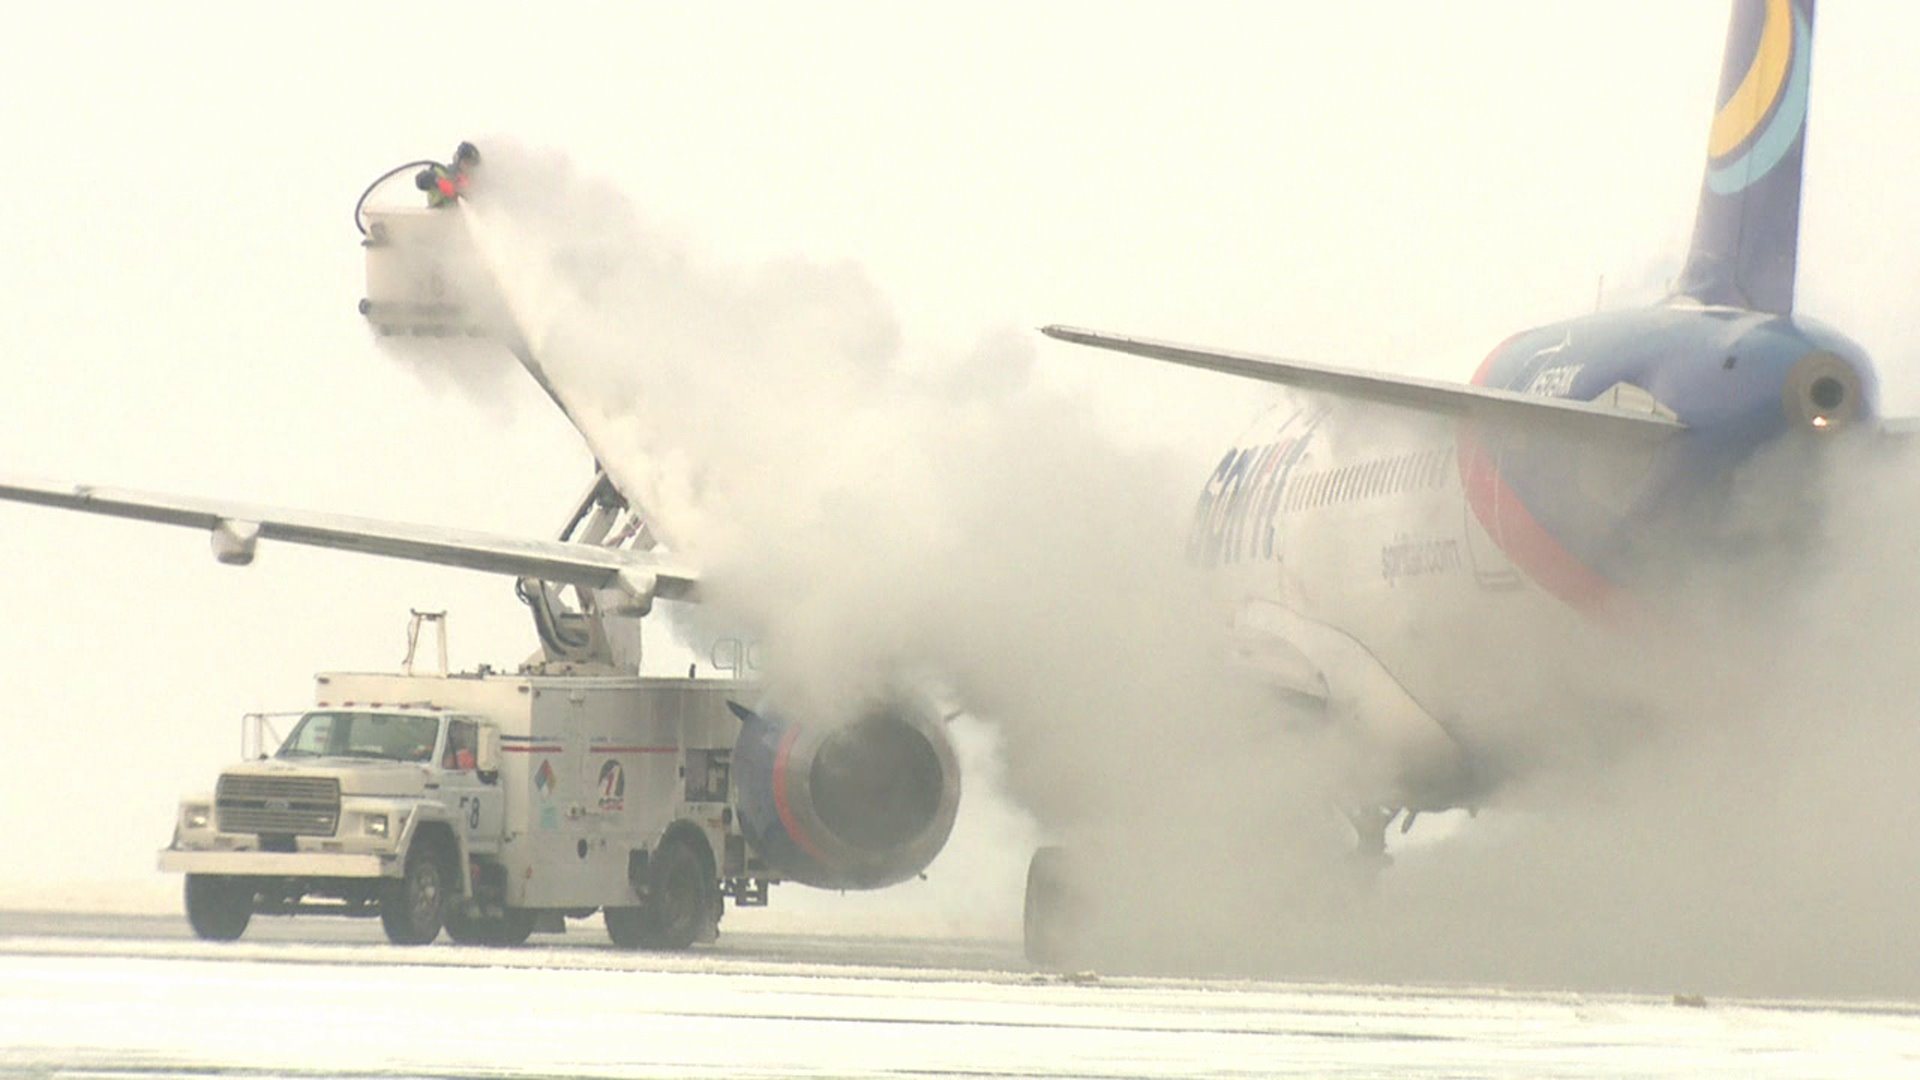 Deicing a jet at Denver International Airport